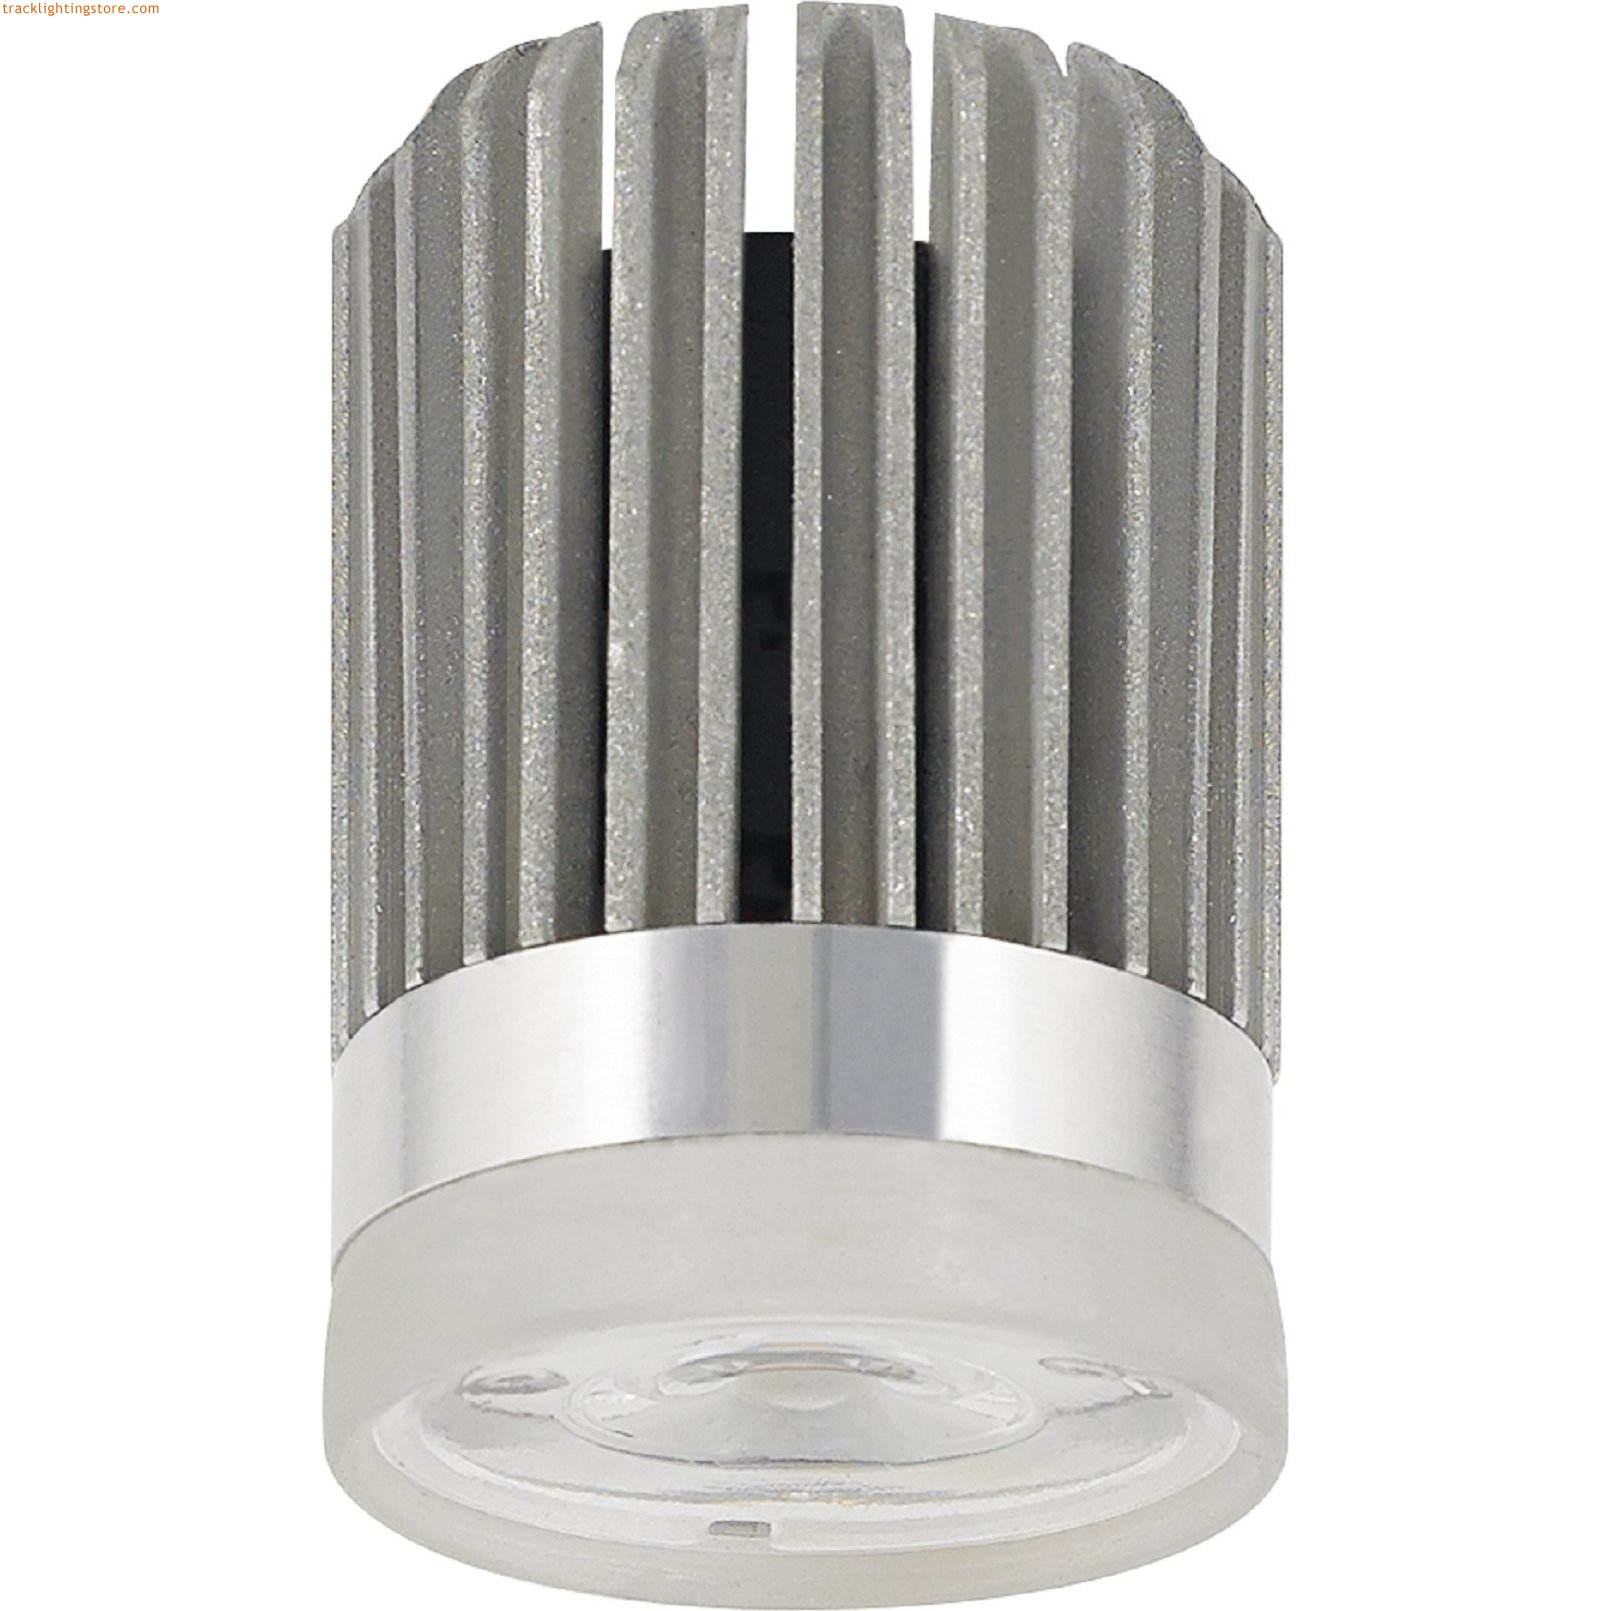 Replacement Pendant Track Lighting: SORAA LED Bi Pin Replacement Pendant